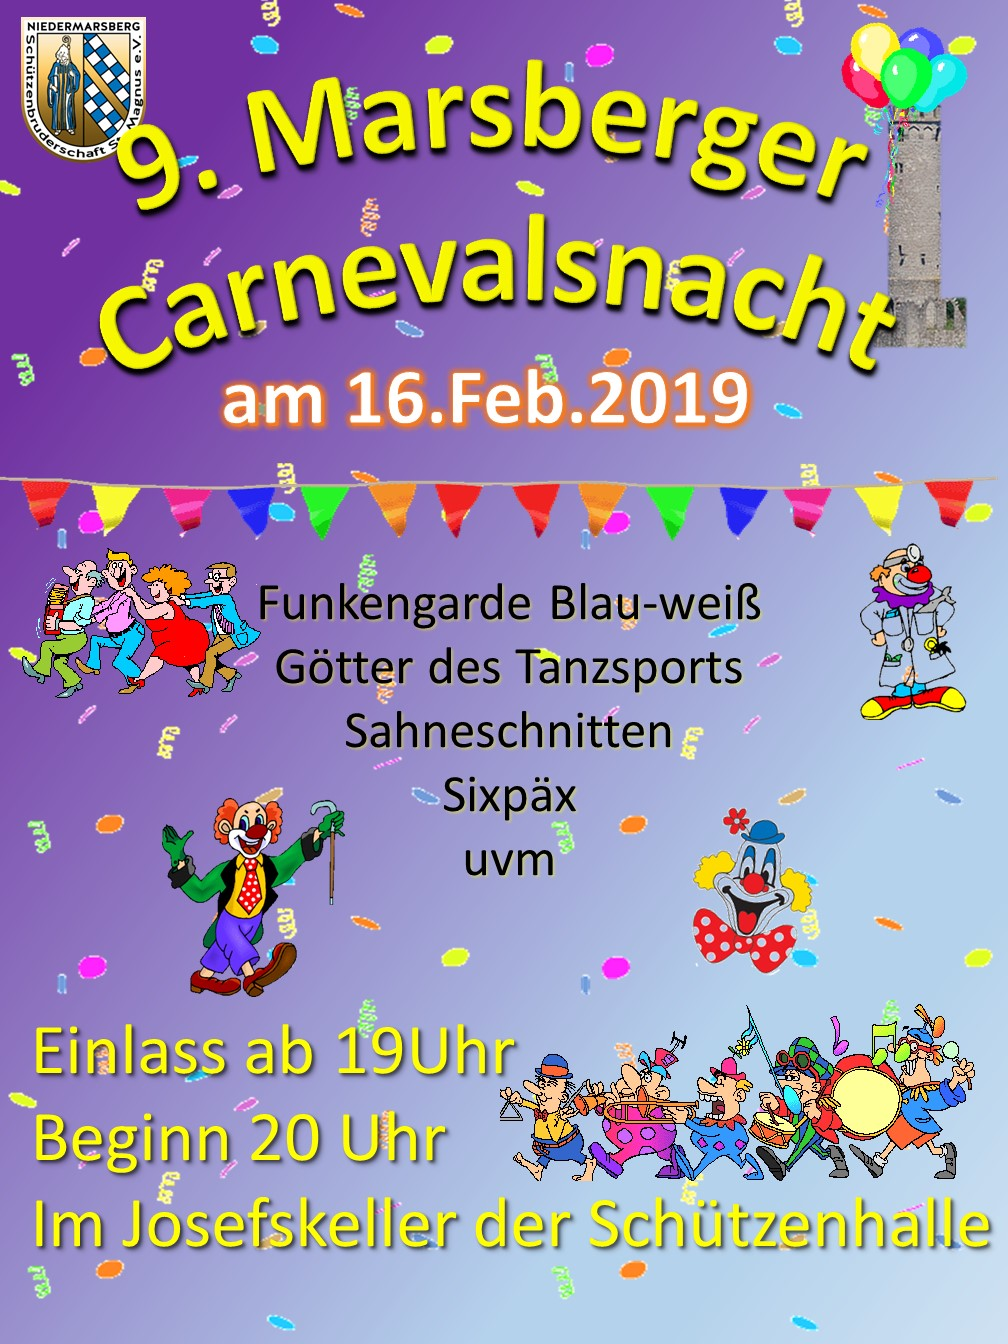 Marsberger Carnevalsnacht am 16. Februar im Josefskeller